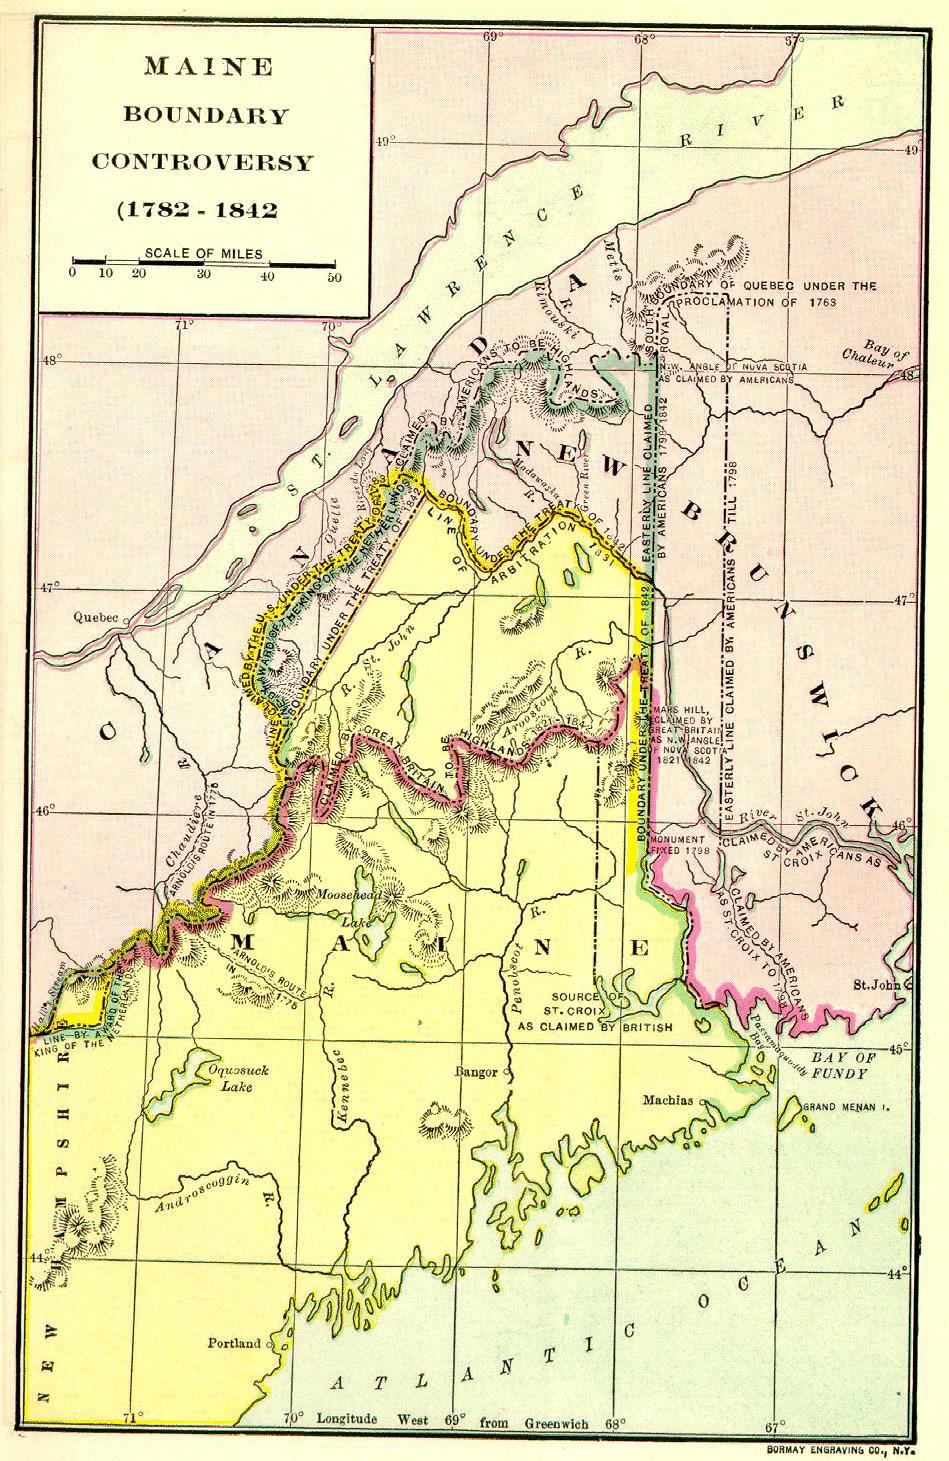 Daniel Webster & the Ashburton Treaty